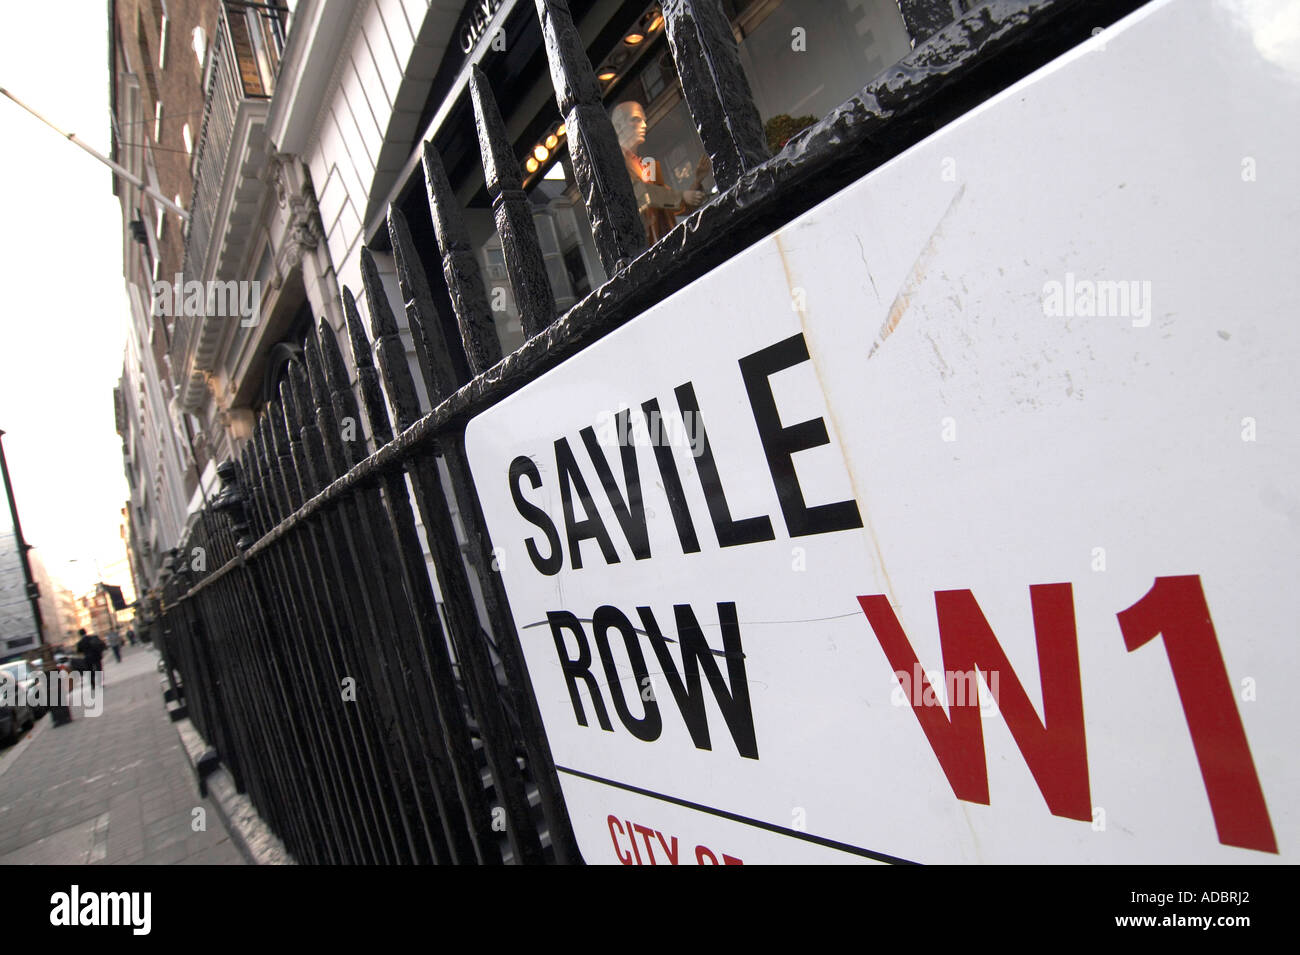 Savile Row in London England - Stock Image